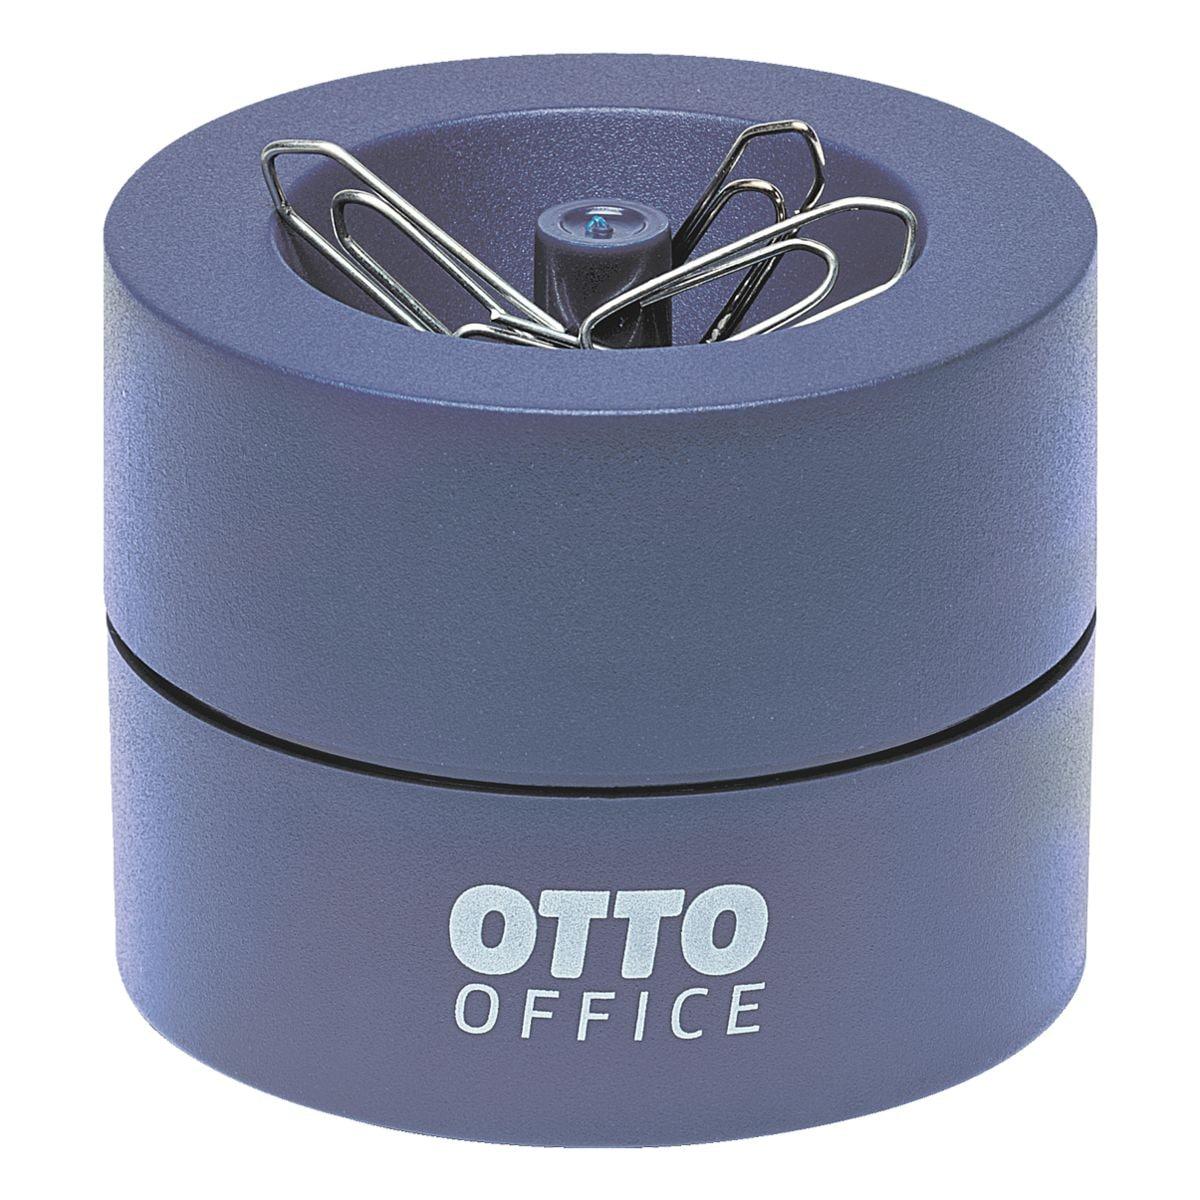 OTTO Office Klammernspender